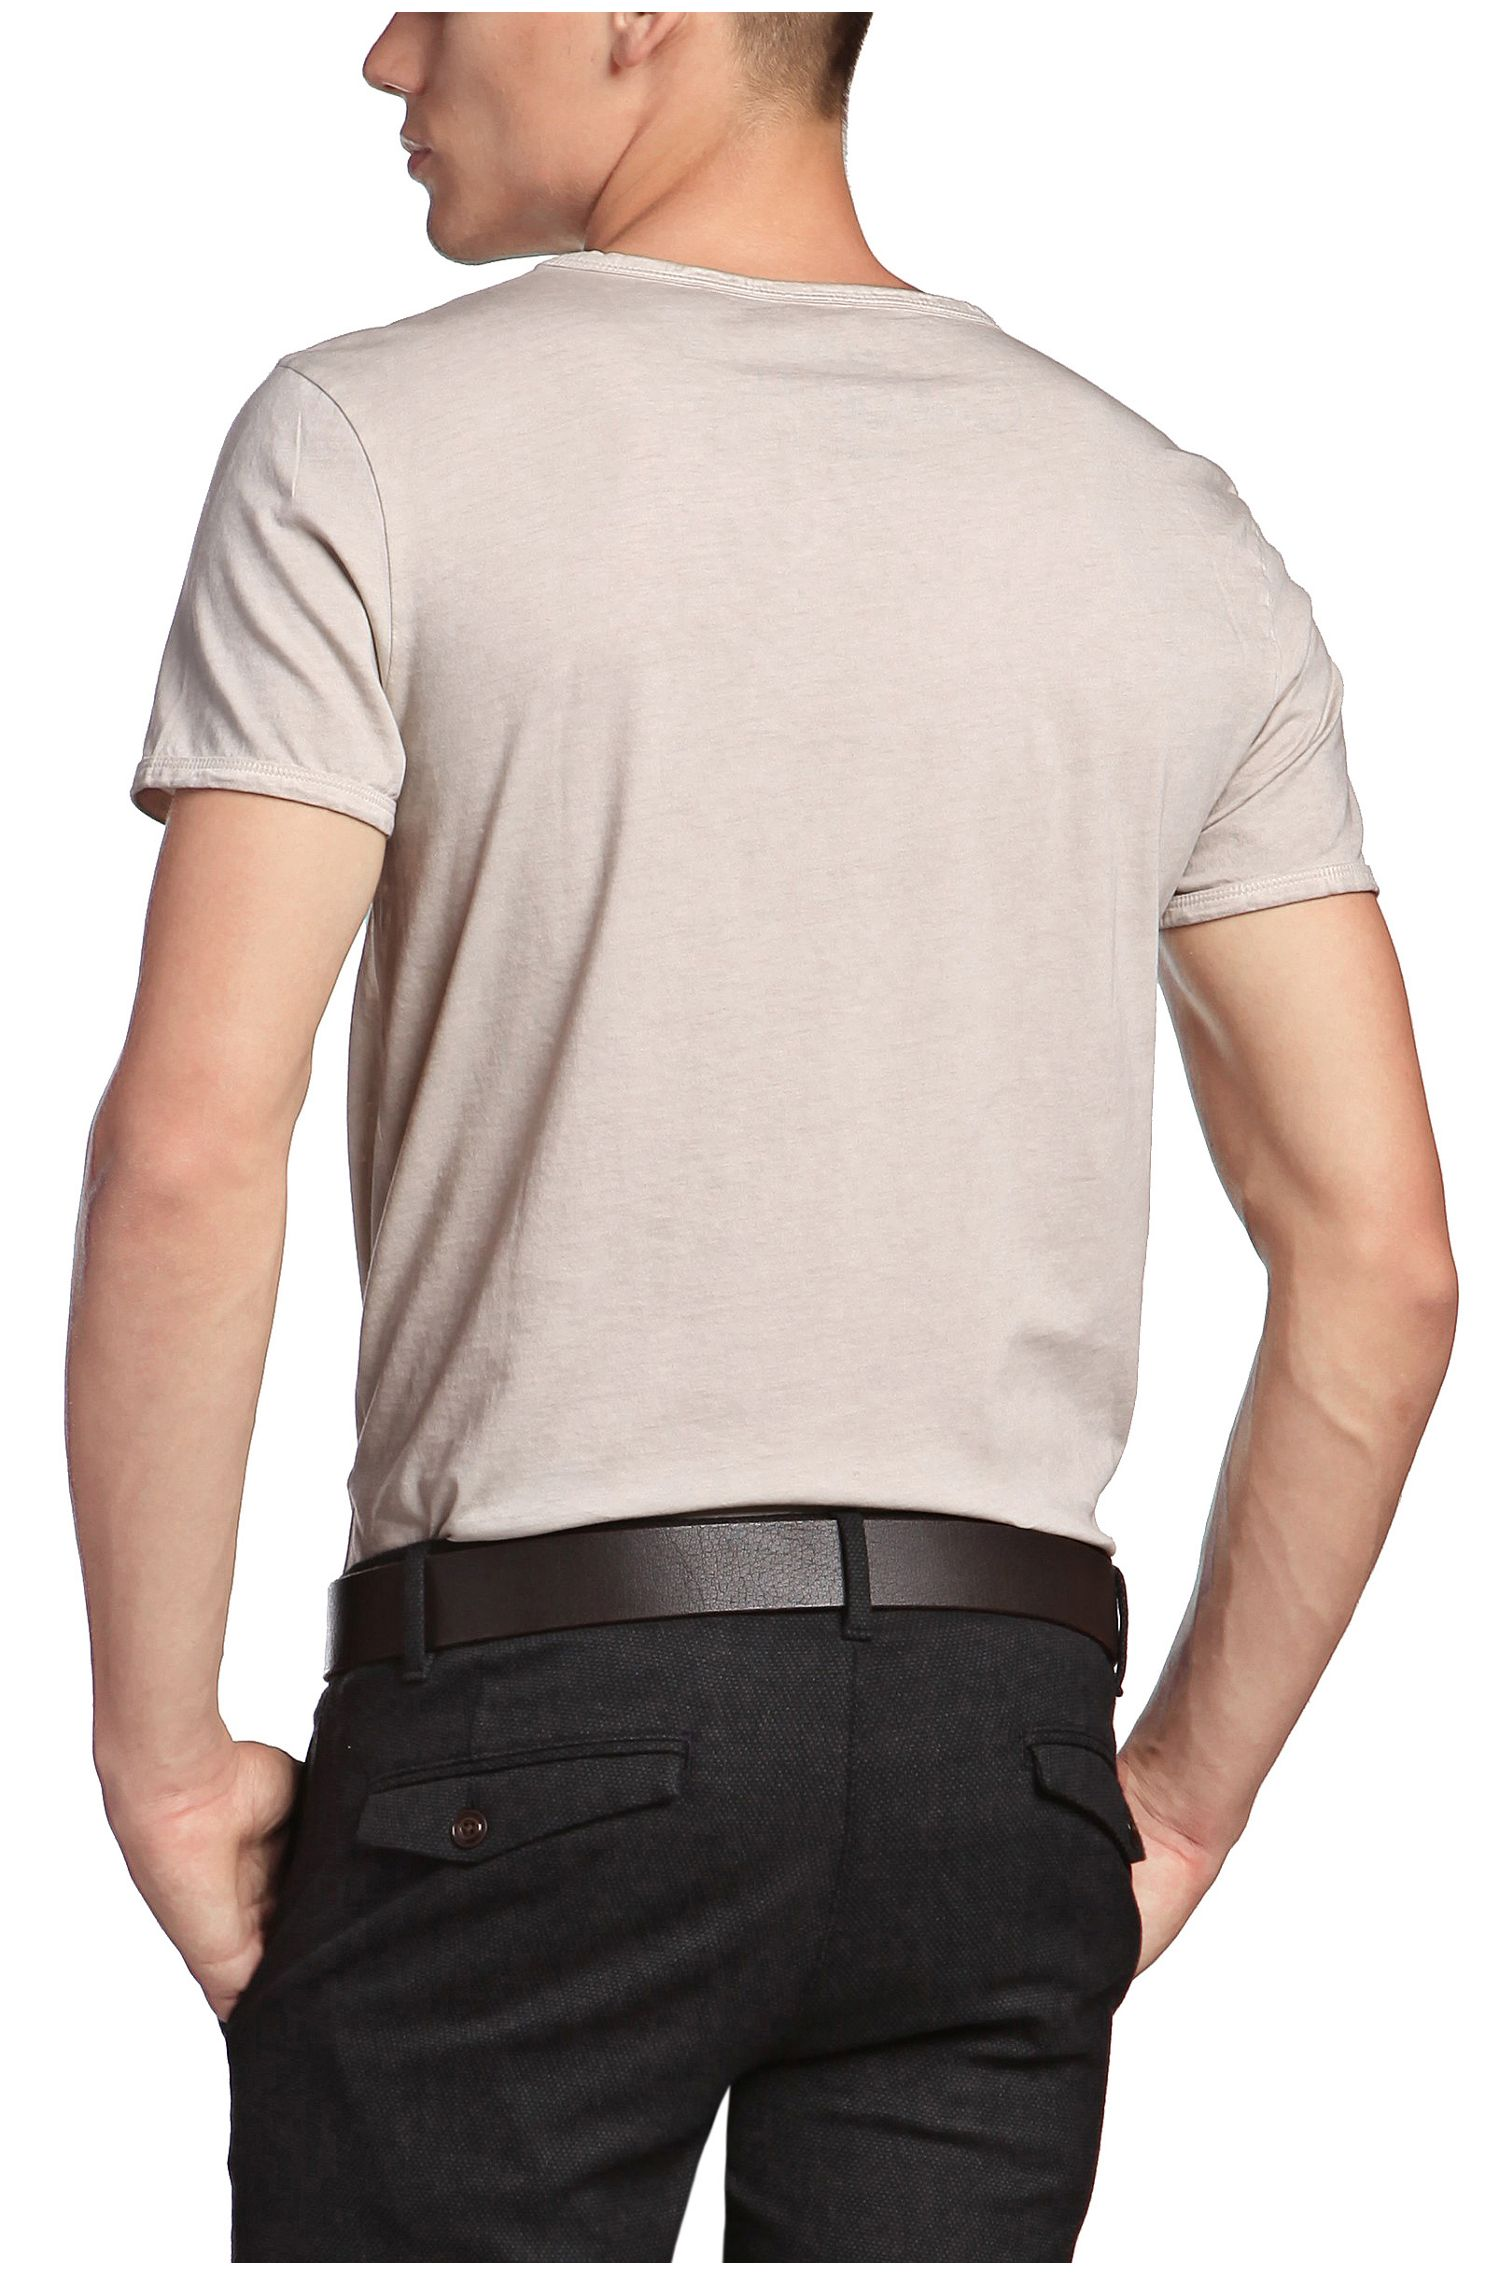 T-shirt 'Tour' met ronde hals